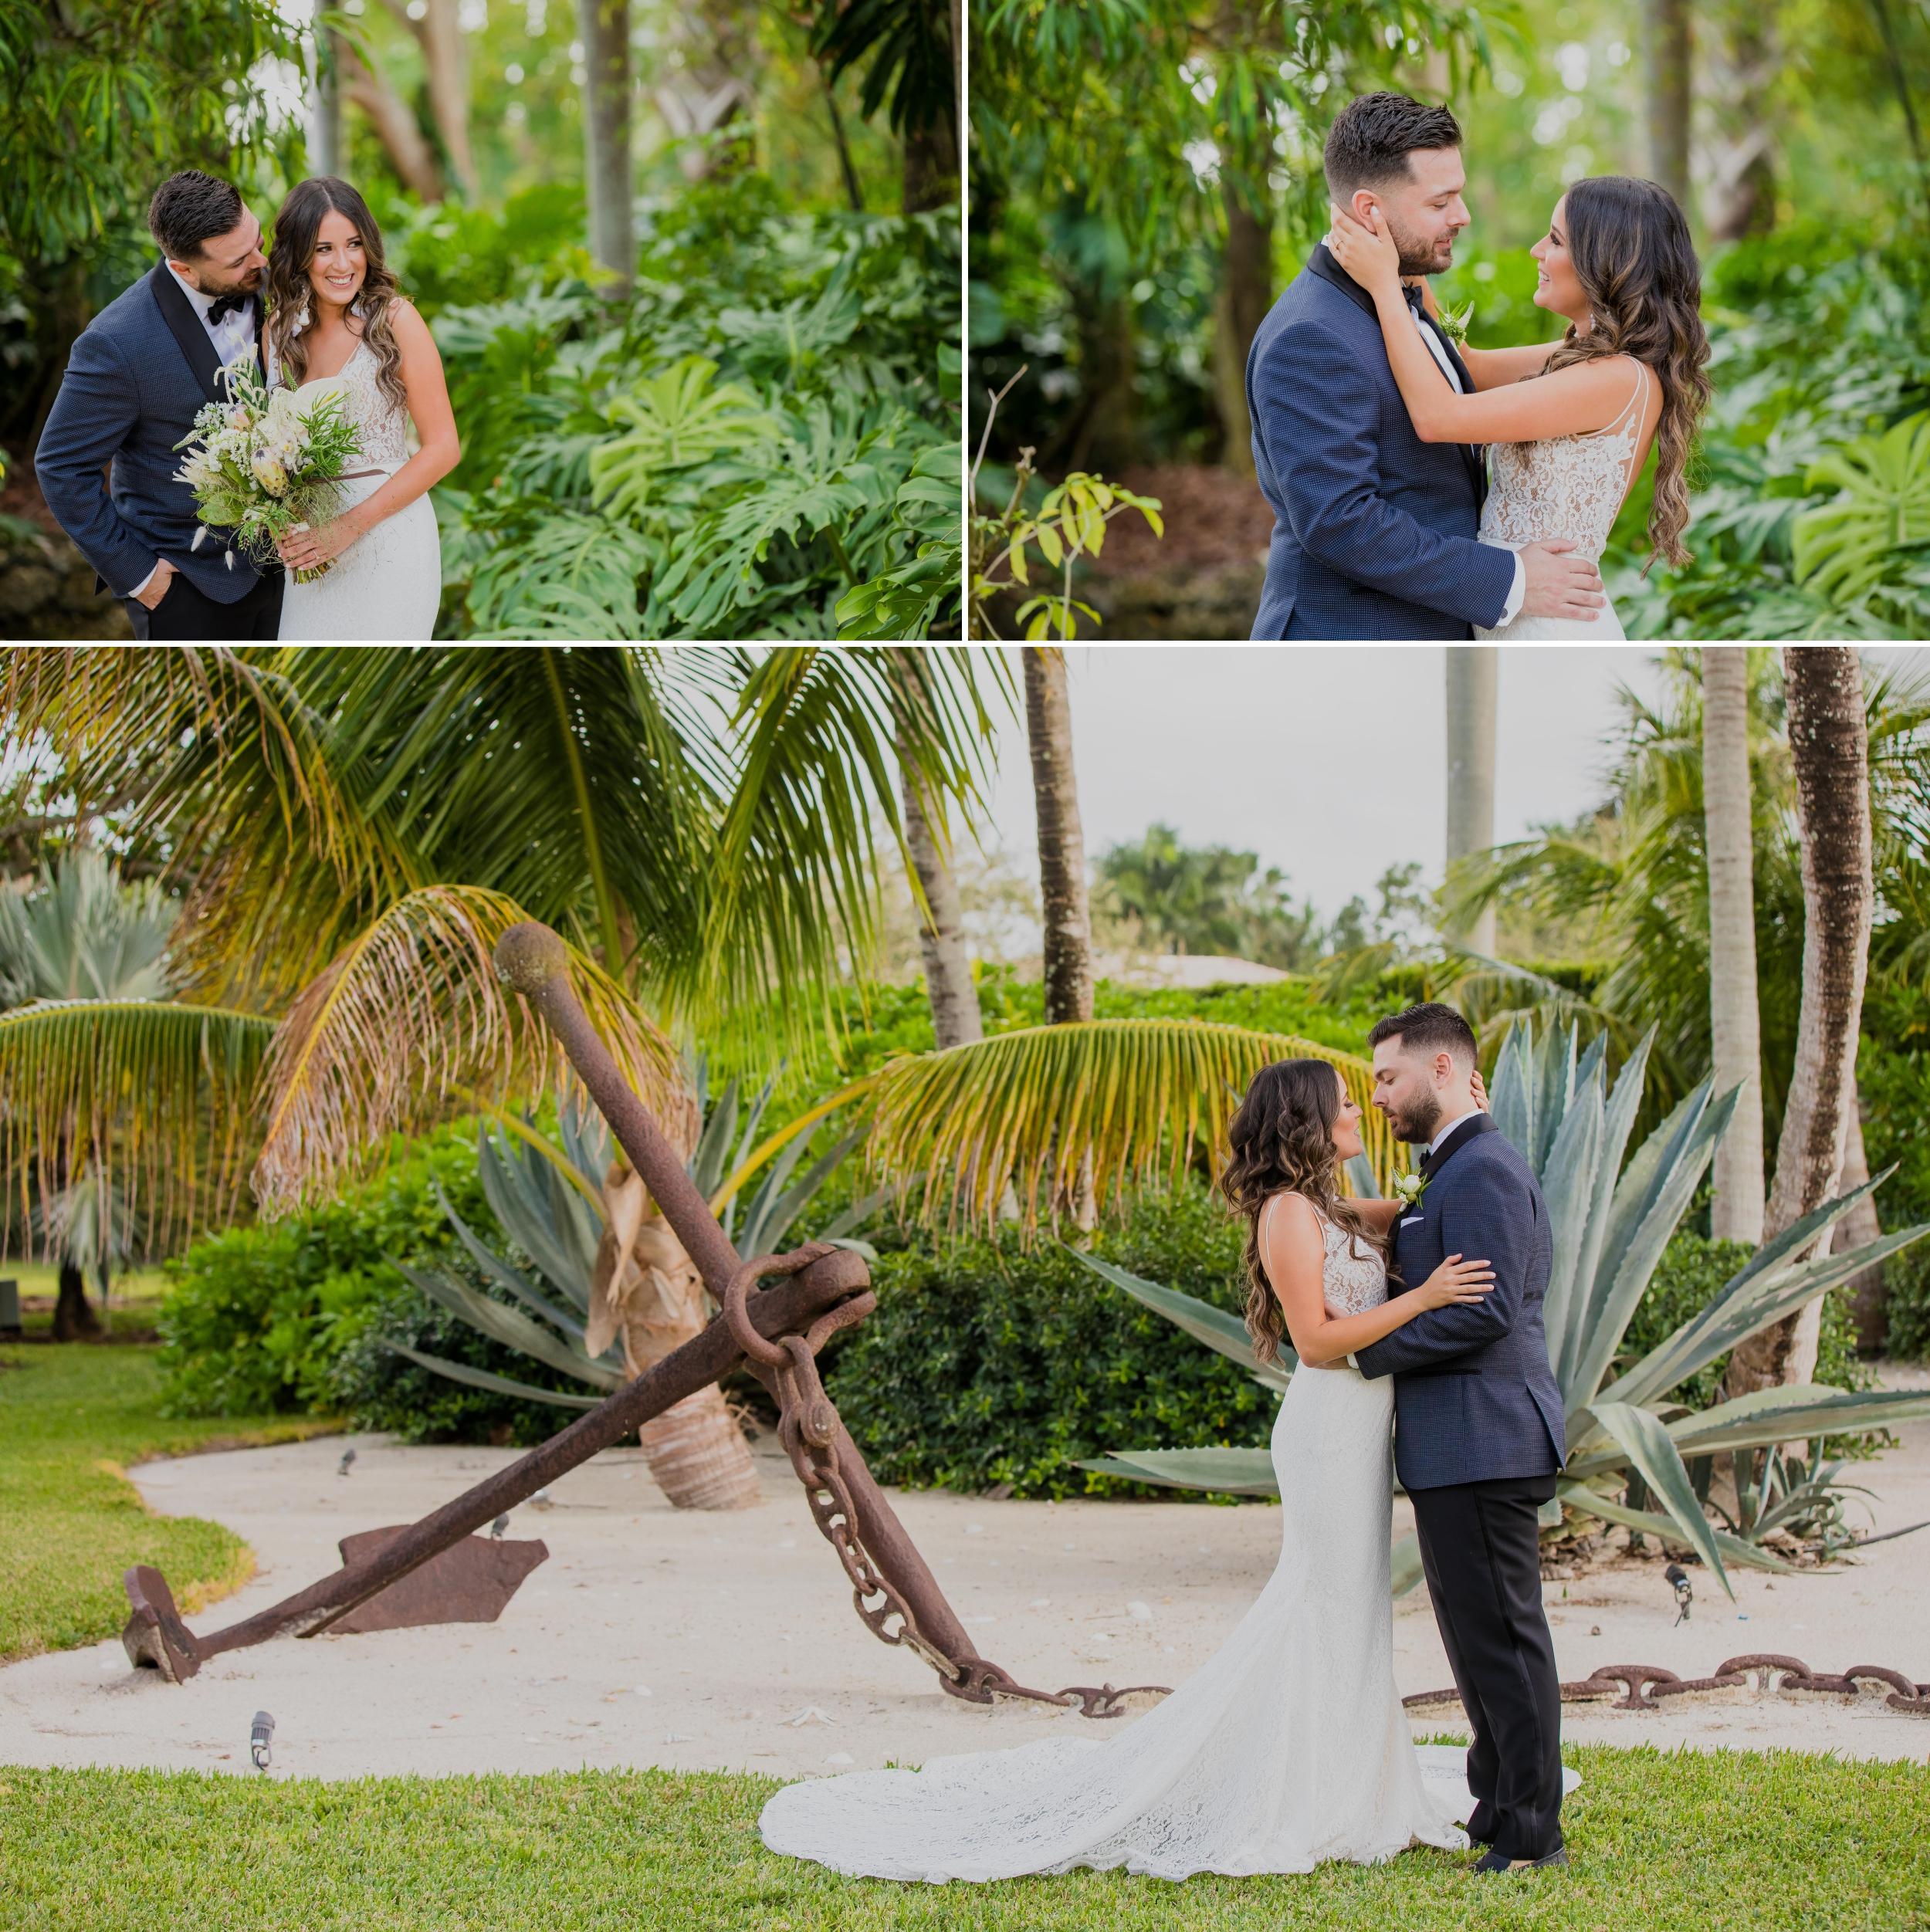 Wedding Whimsical Key West House  - Photography by Santy Martinez 7.jpg